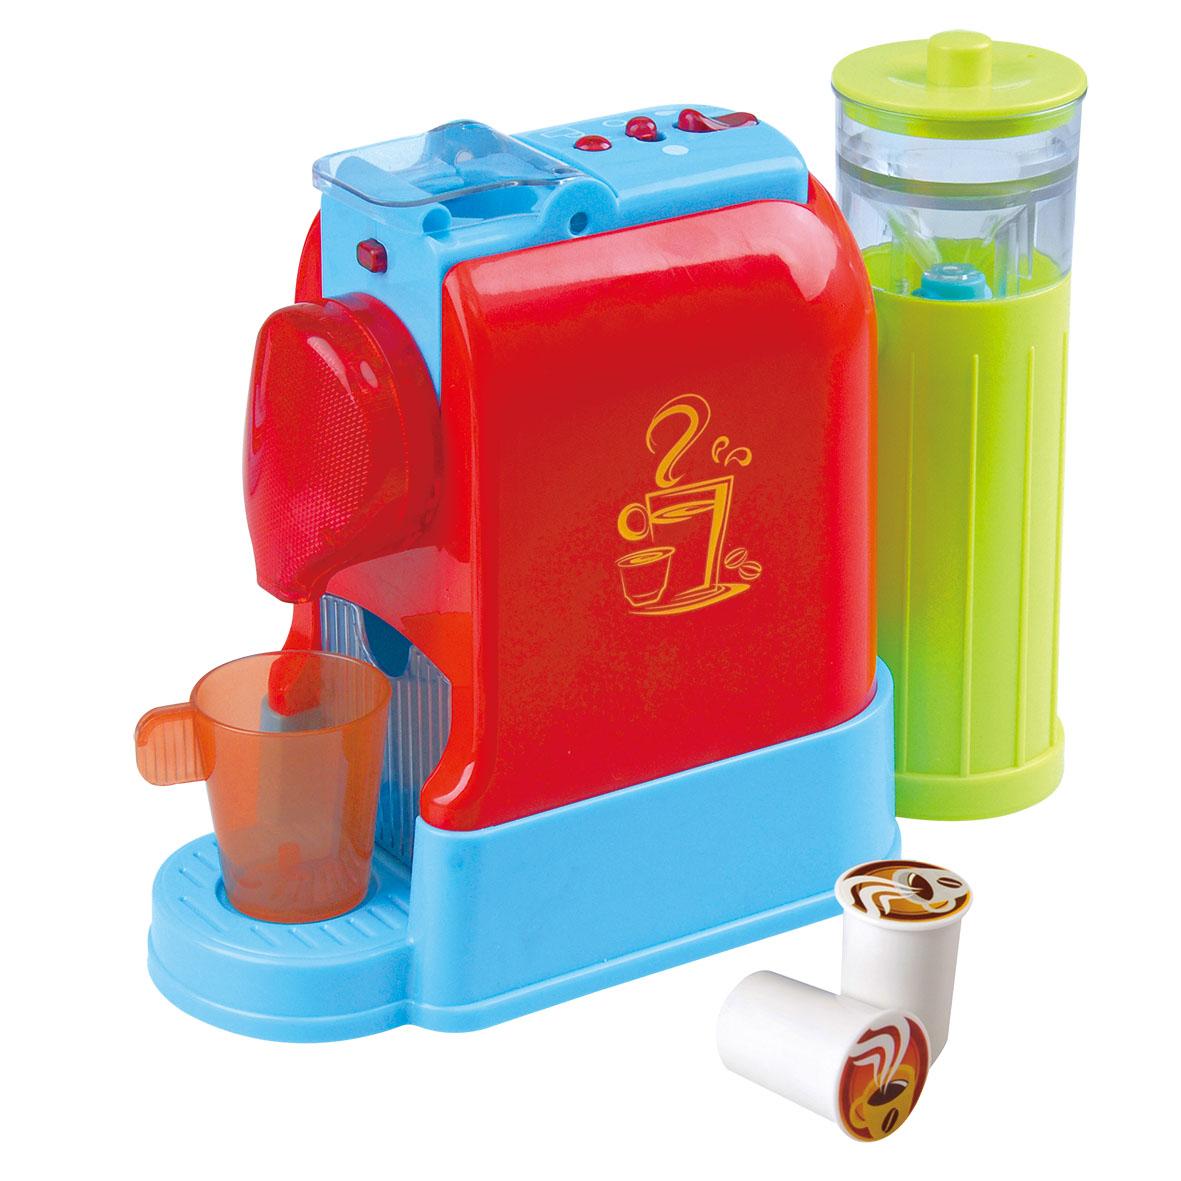 Сюжетно-ролевые игрушки Play 3150.1 электрокофеварка playgo электрокофеварка play 3150